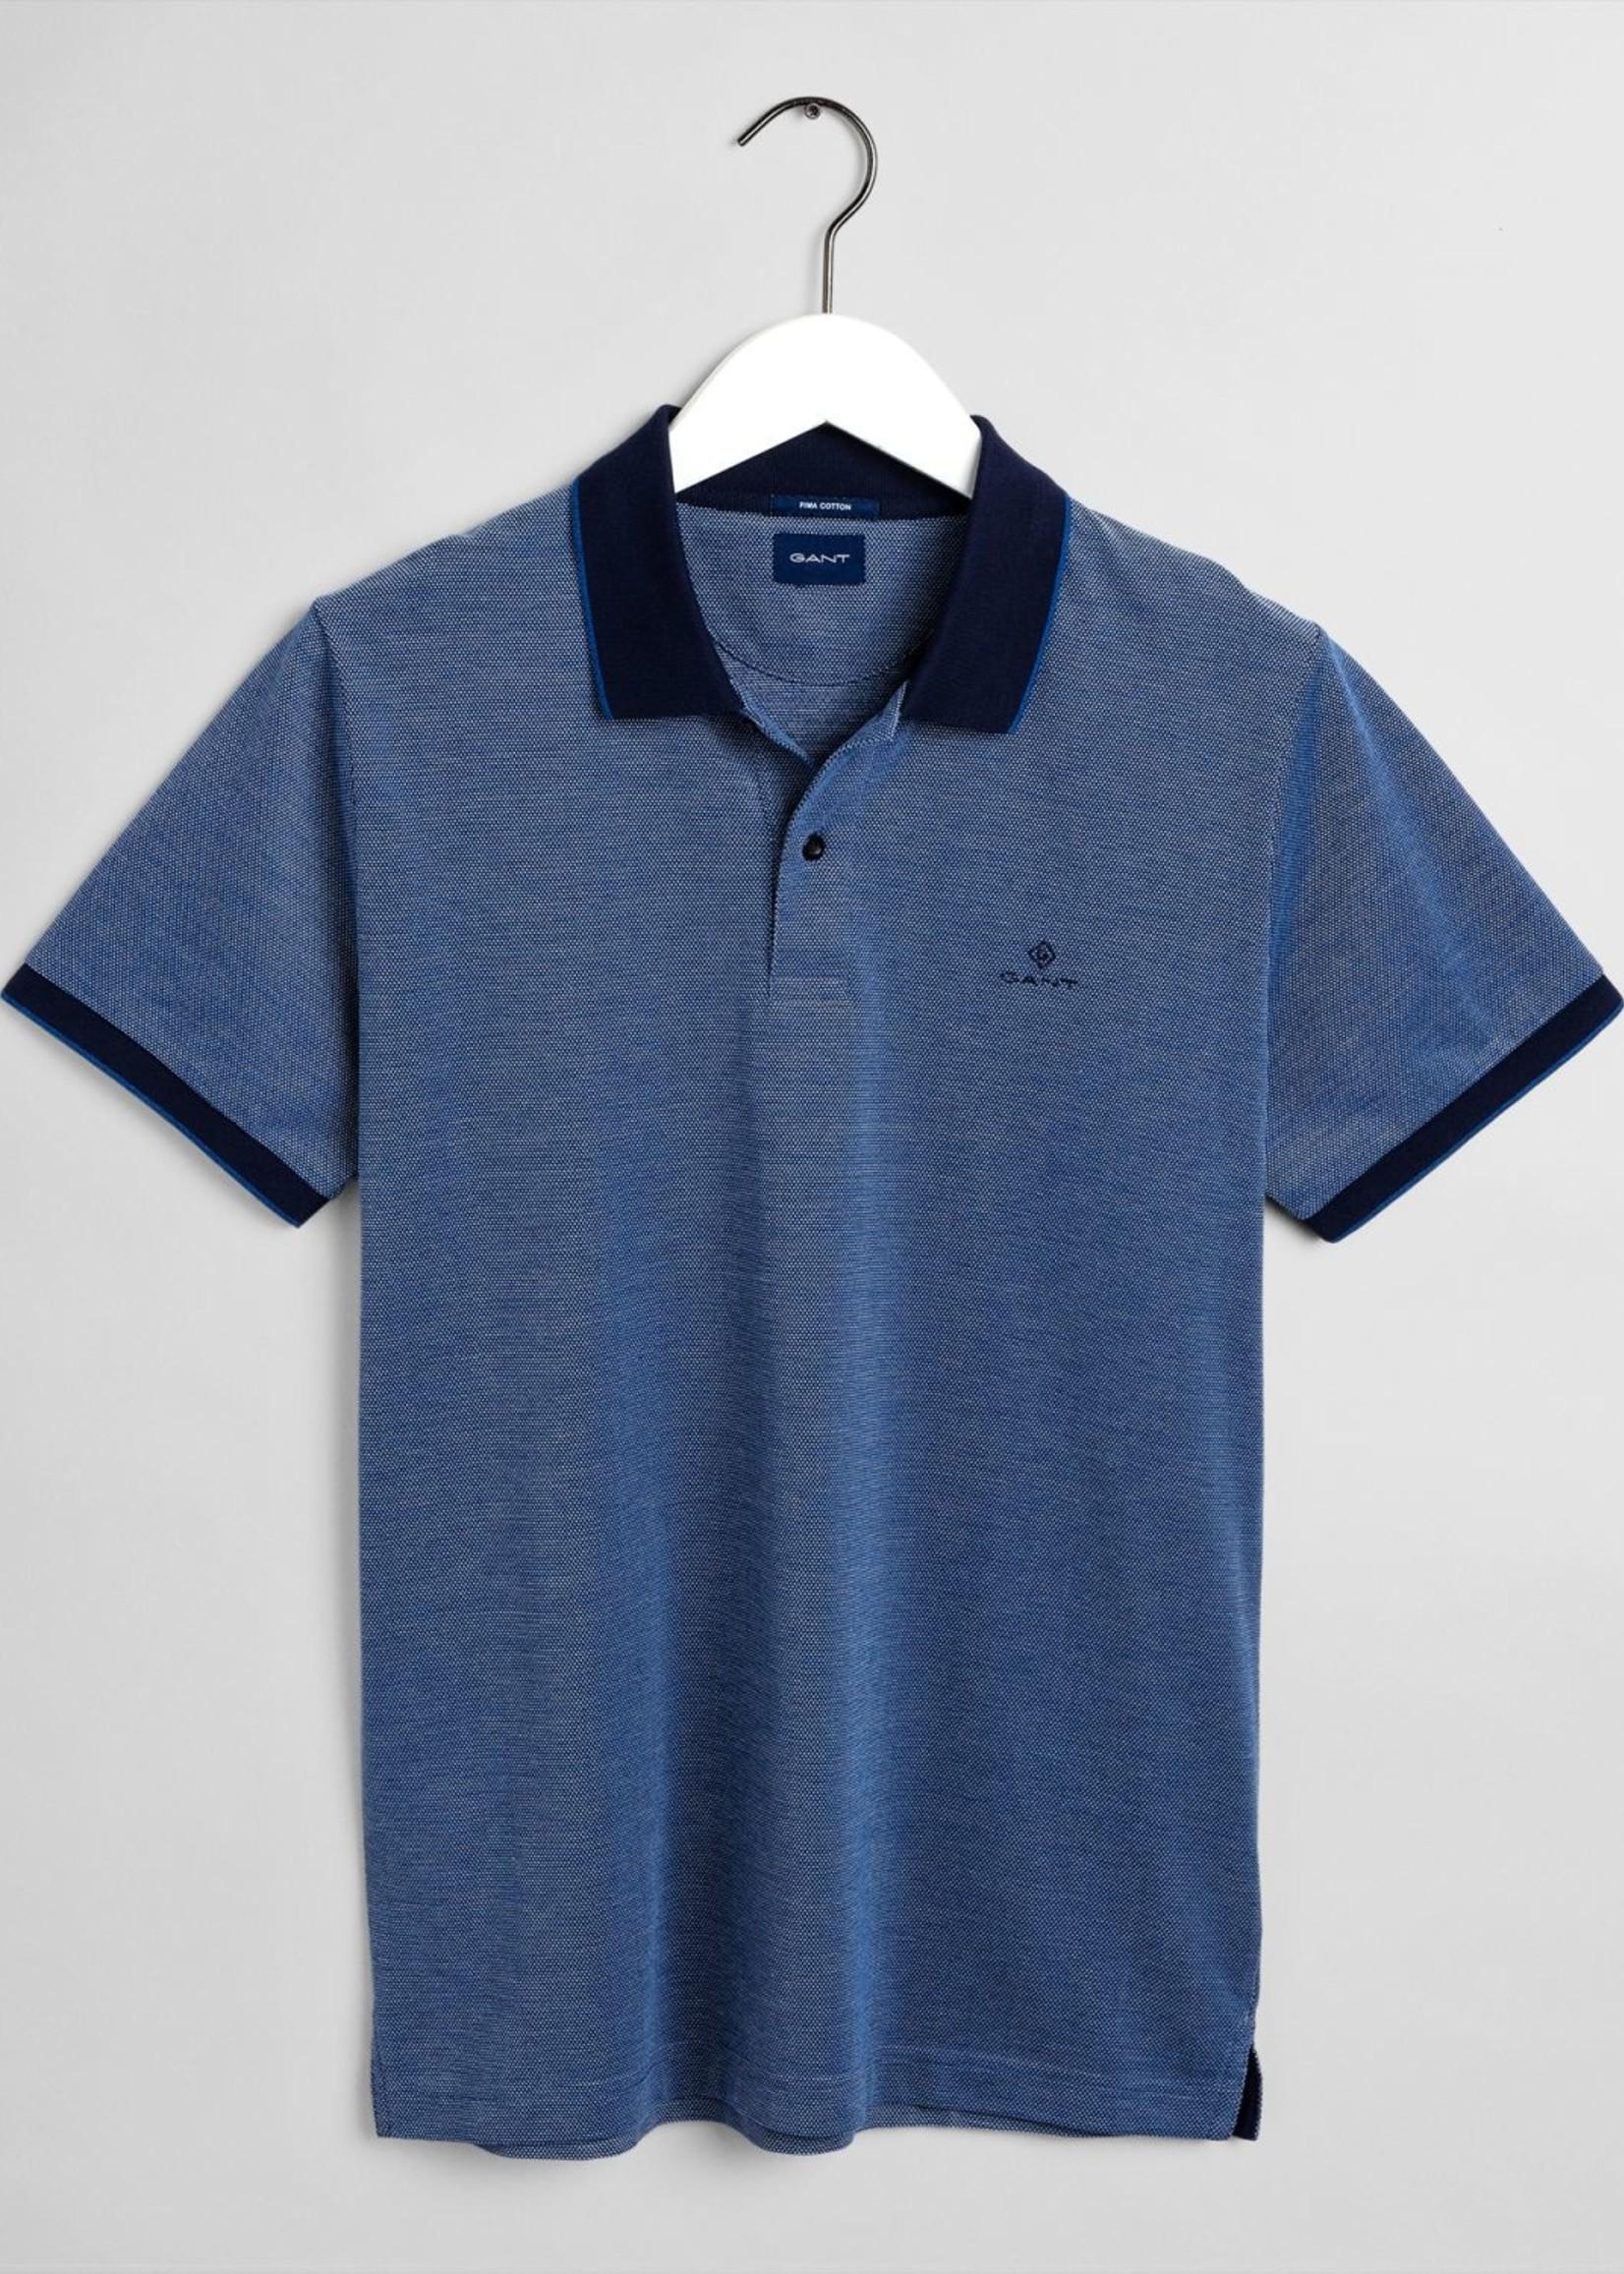 GANT 4-Color Oxford Piqué Polo Shirt   Blue   GANT